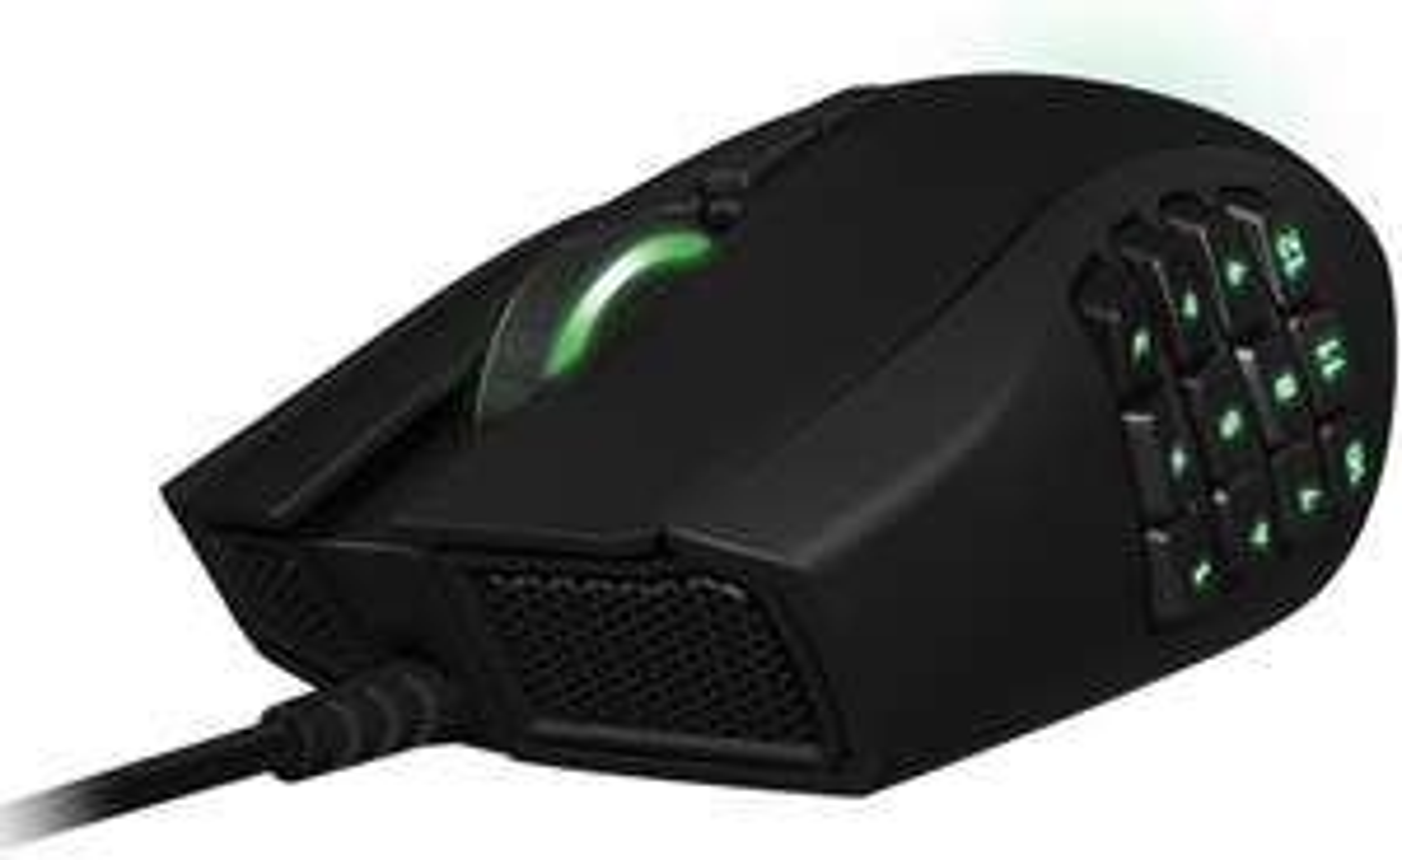 Souris Gaming filaire USB Razer Naga 2014  Noir